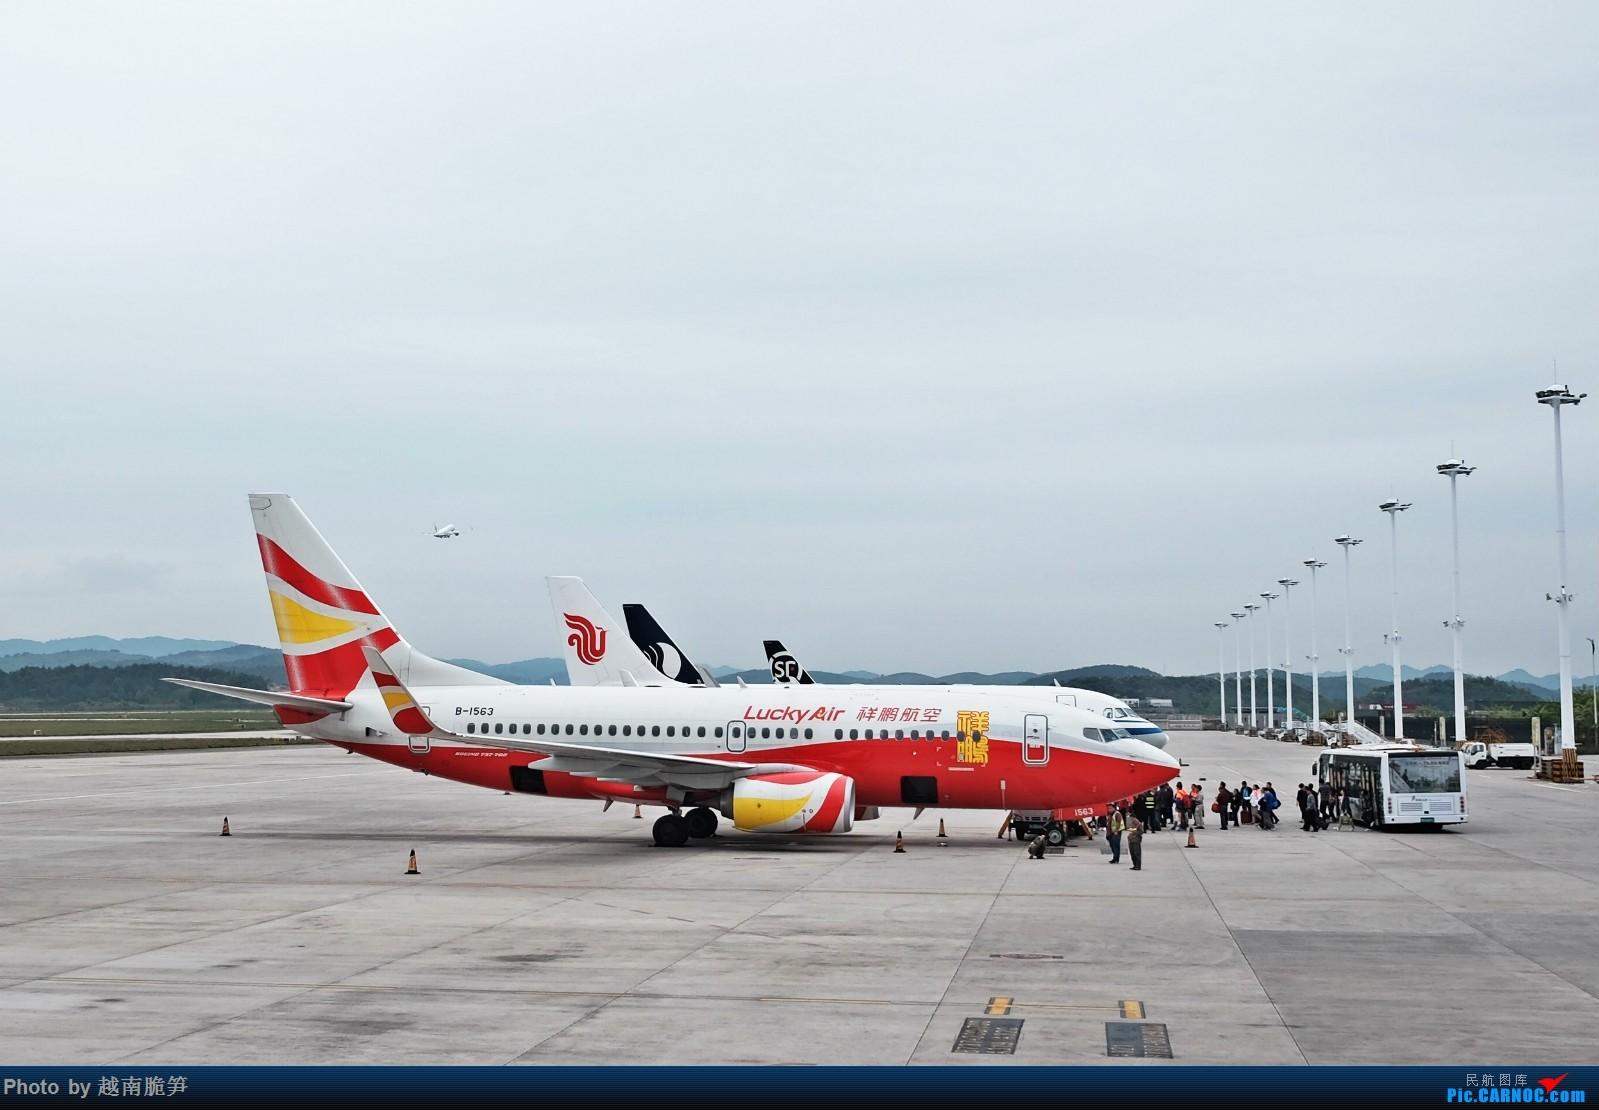 Re:[原创]宁波——贵阳往返,南航执飞 BOEING 737-700 B-1563